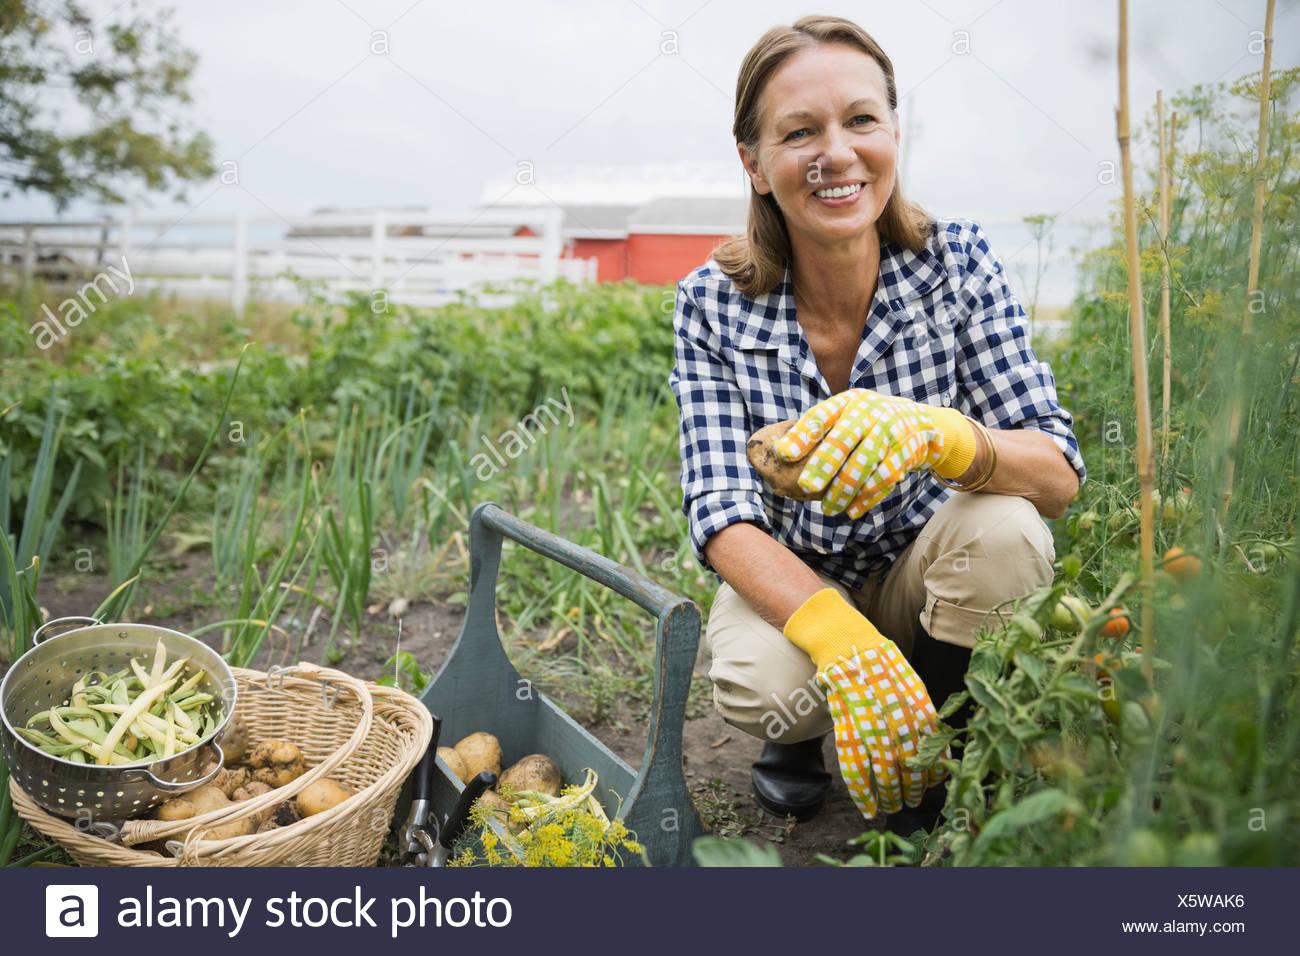 Portrait of senior woman harvesting vegetables Photo Stock